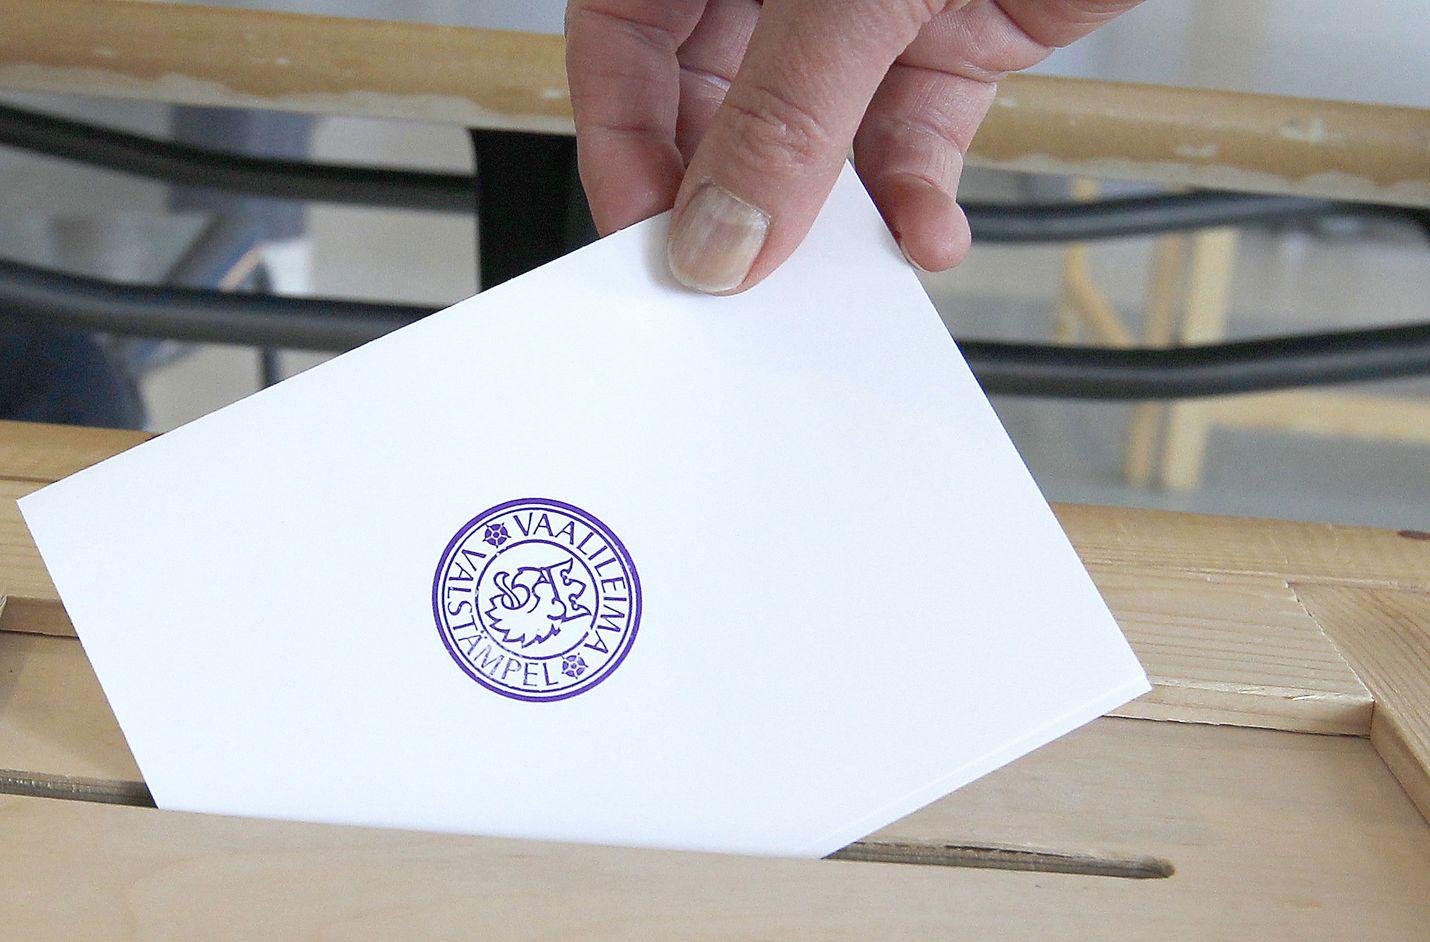 äänestyskoppi